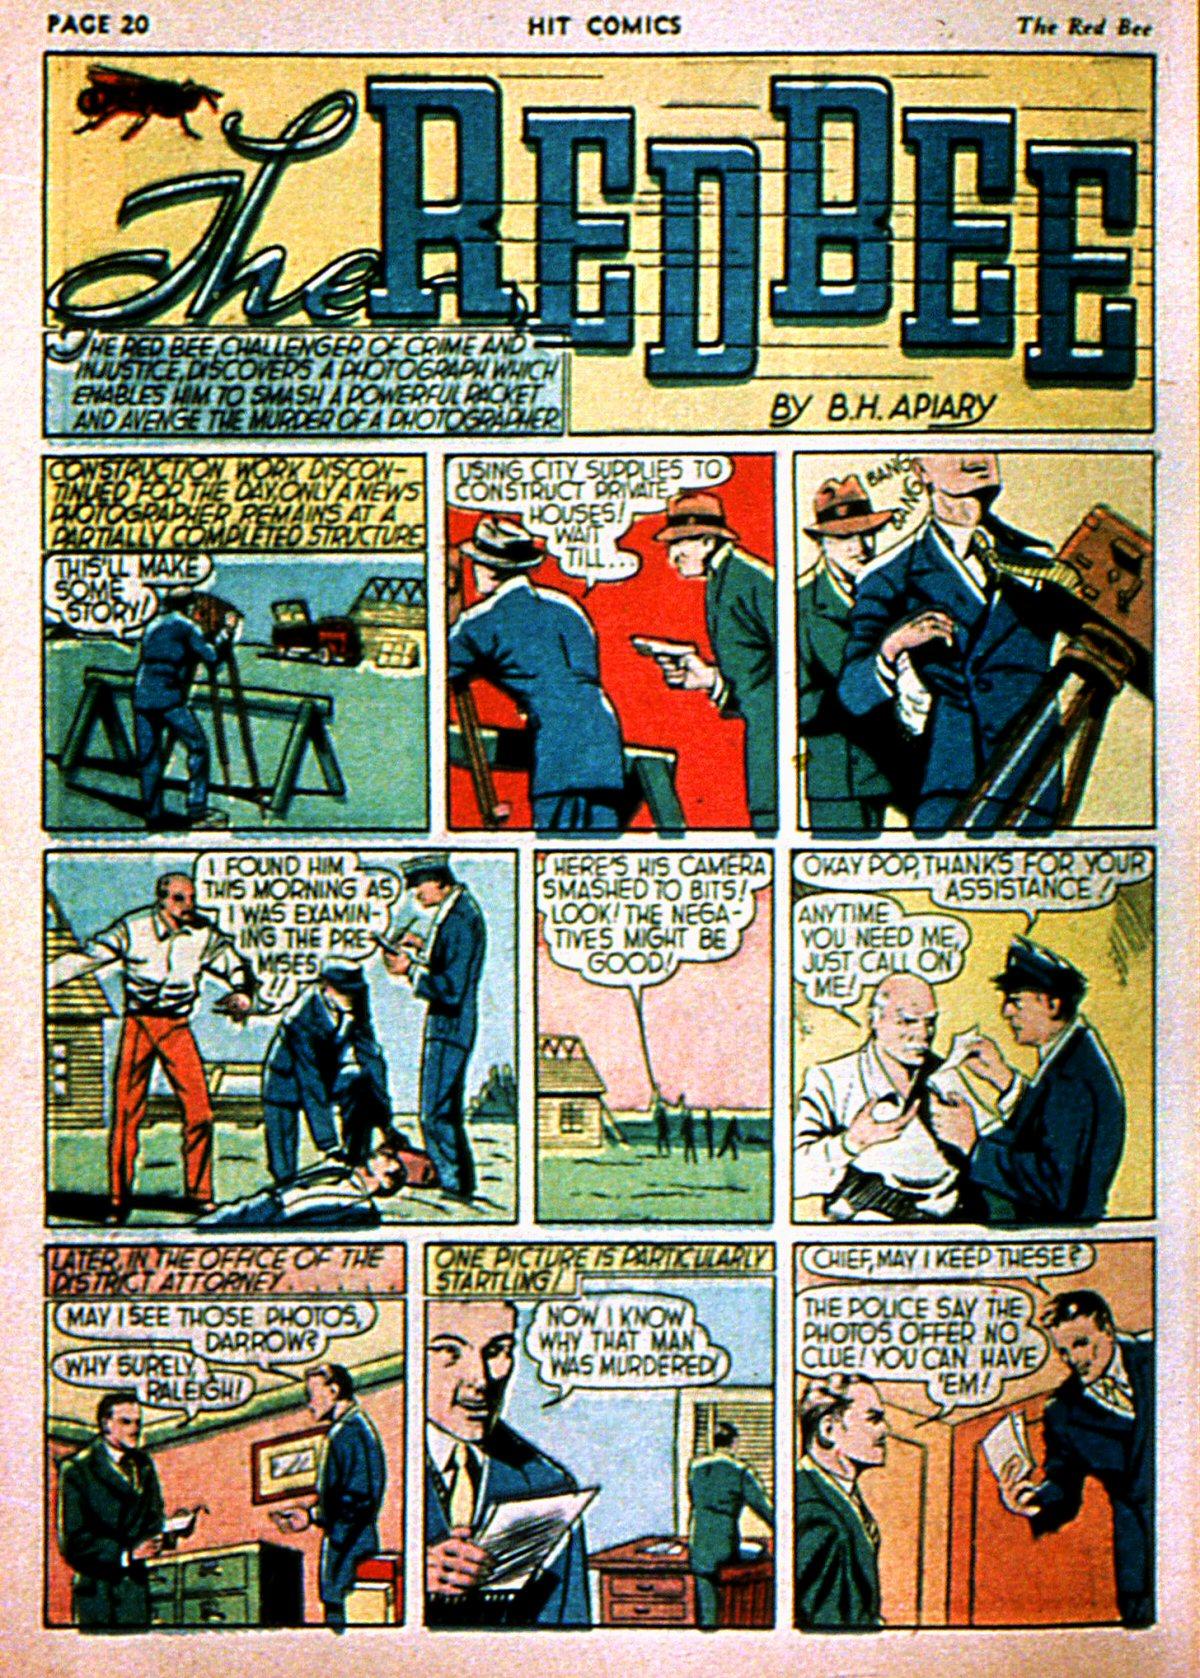 Read online Hit Comics comic -  Issue #3 - 22